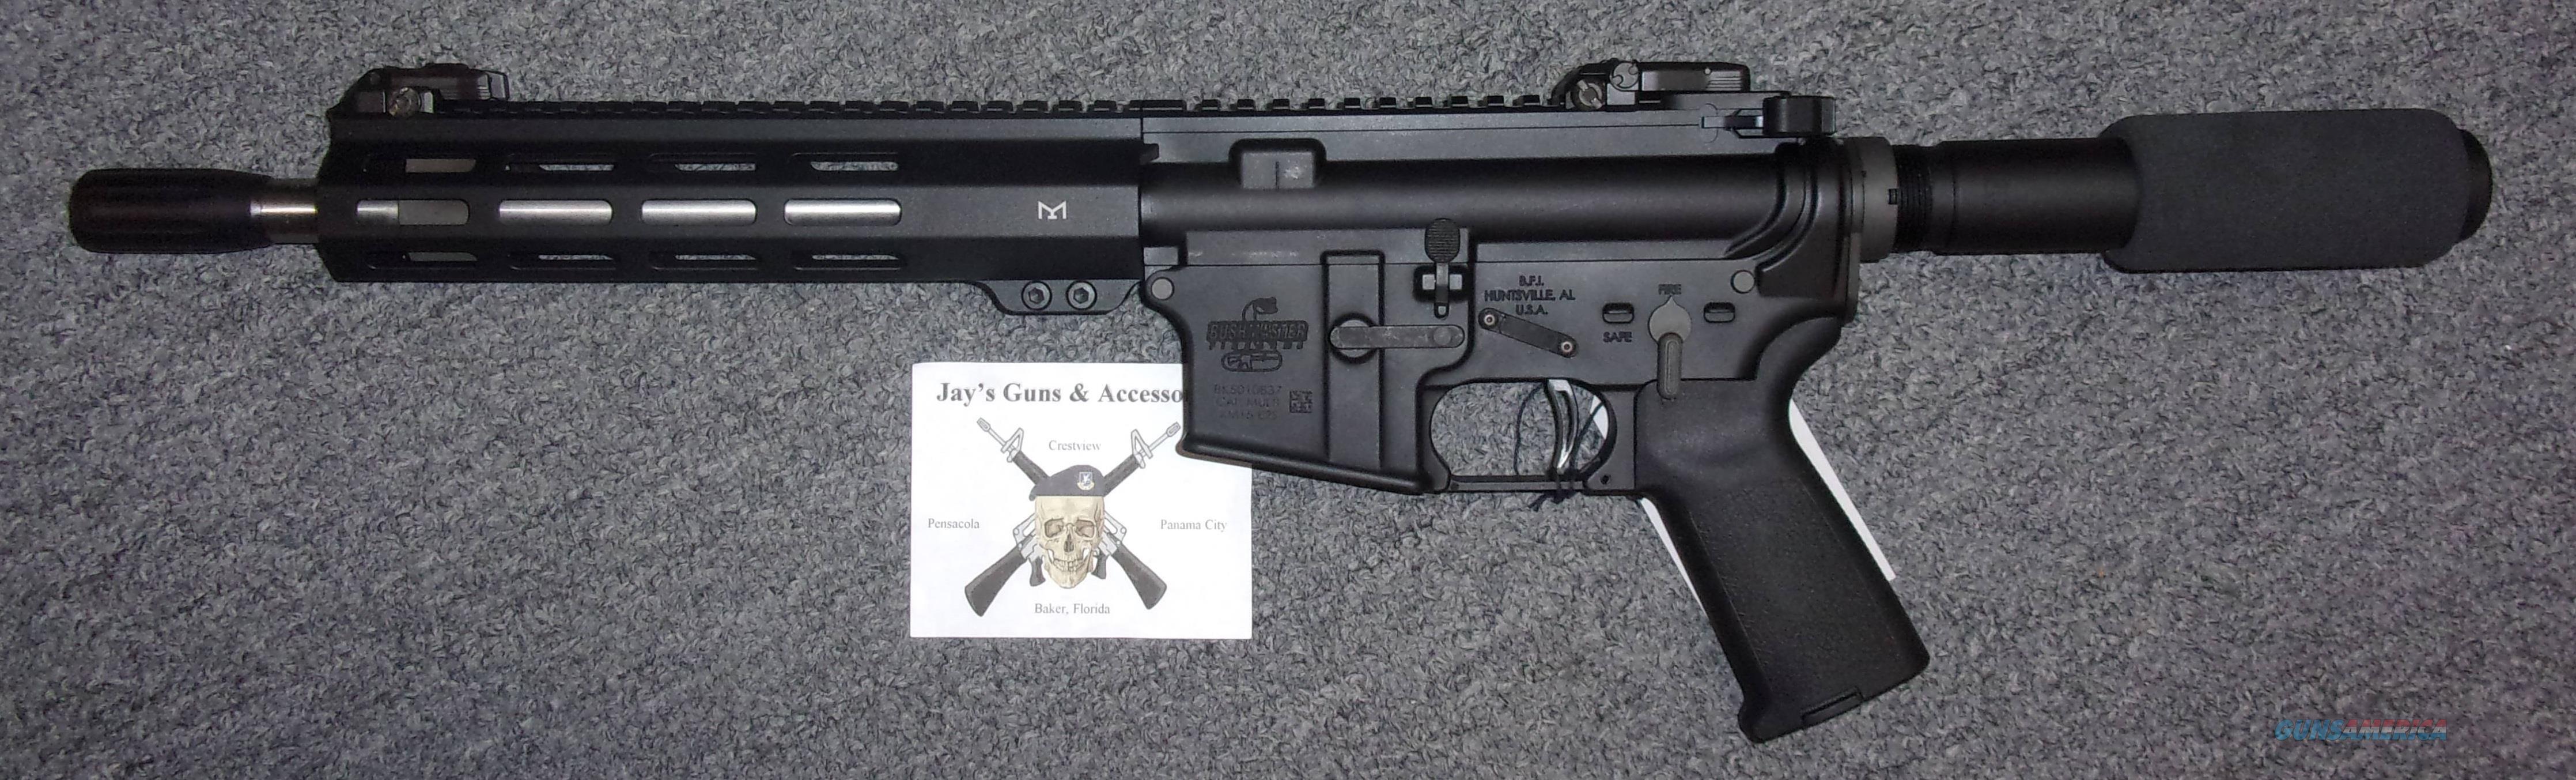 Bushmaster XM15-E2S Pistol  Guns > Pistols > Bushmaster Pistols